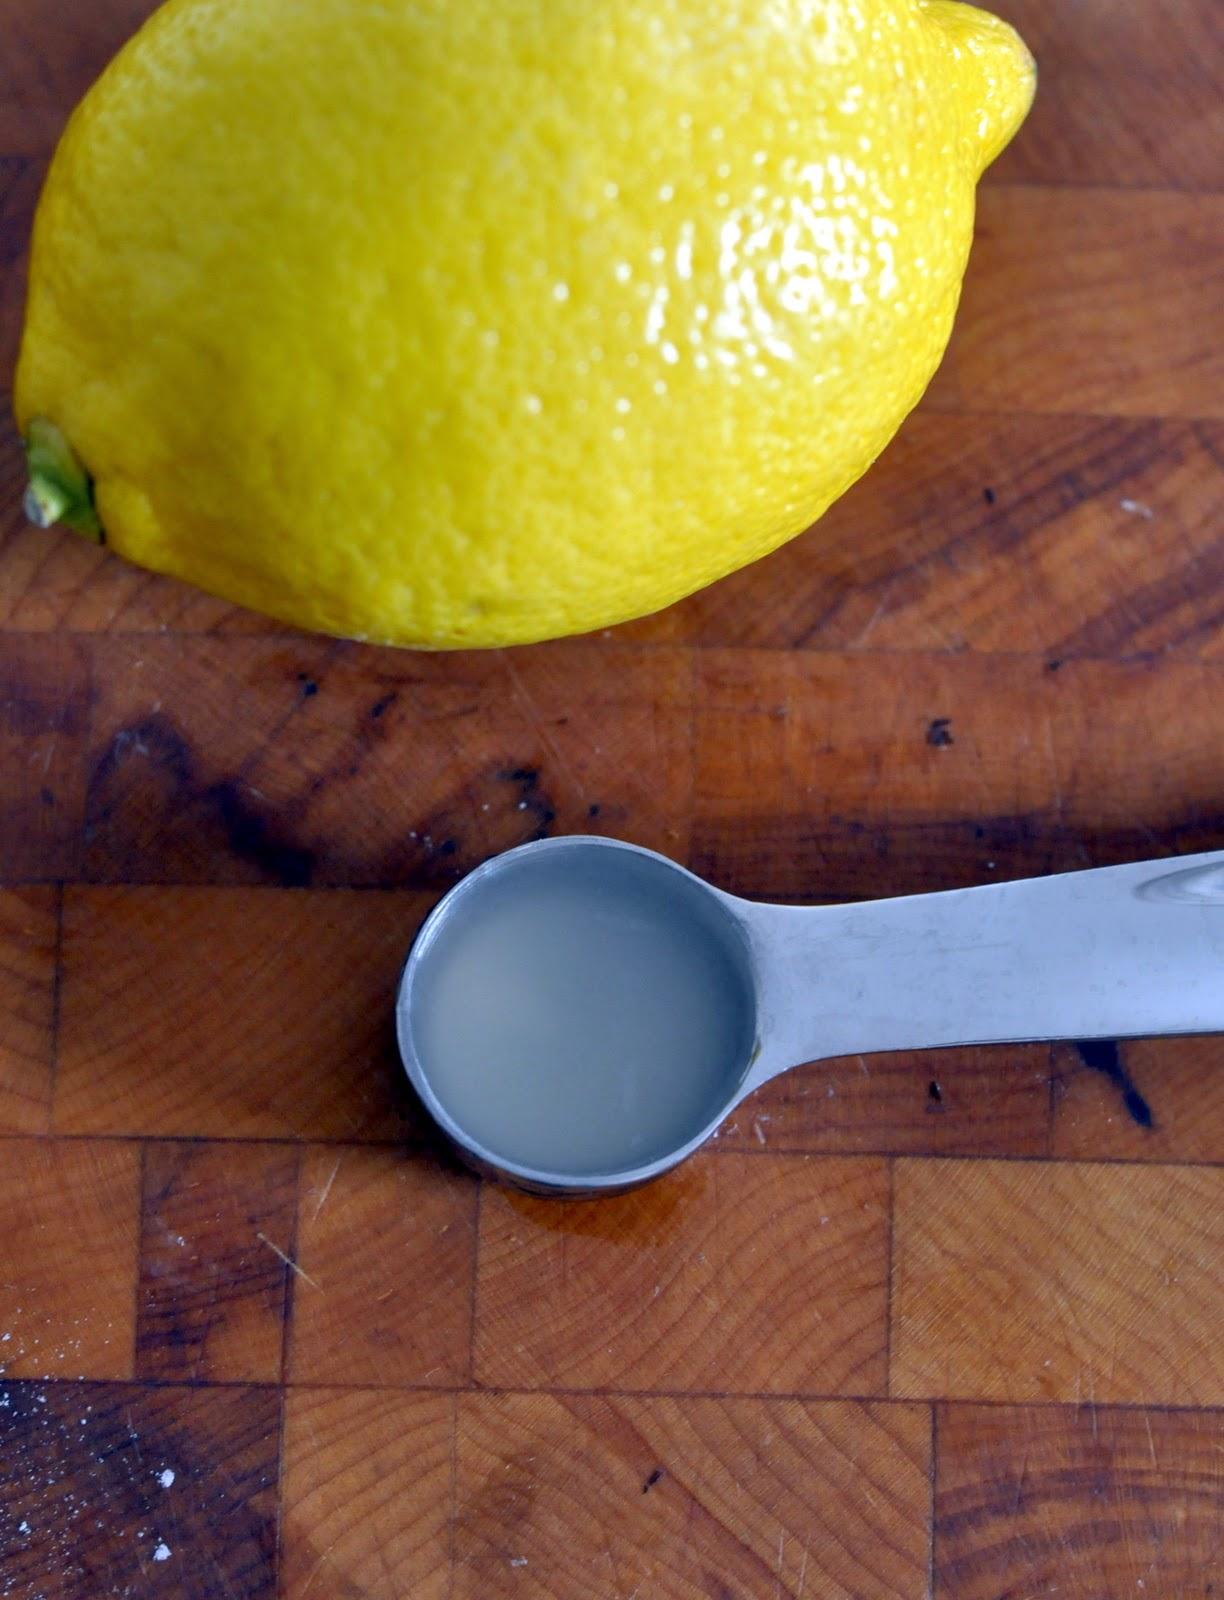 Lemon-and-Lemon-Juice-tasteasyougo.com